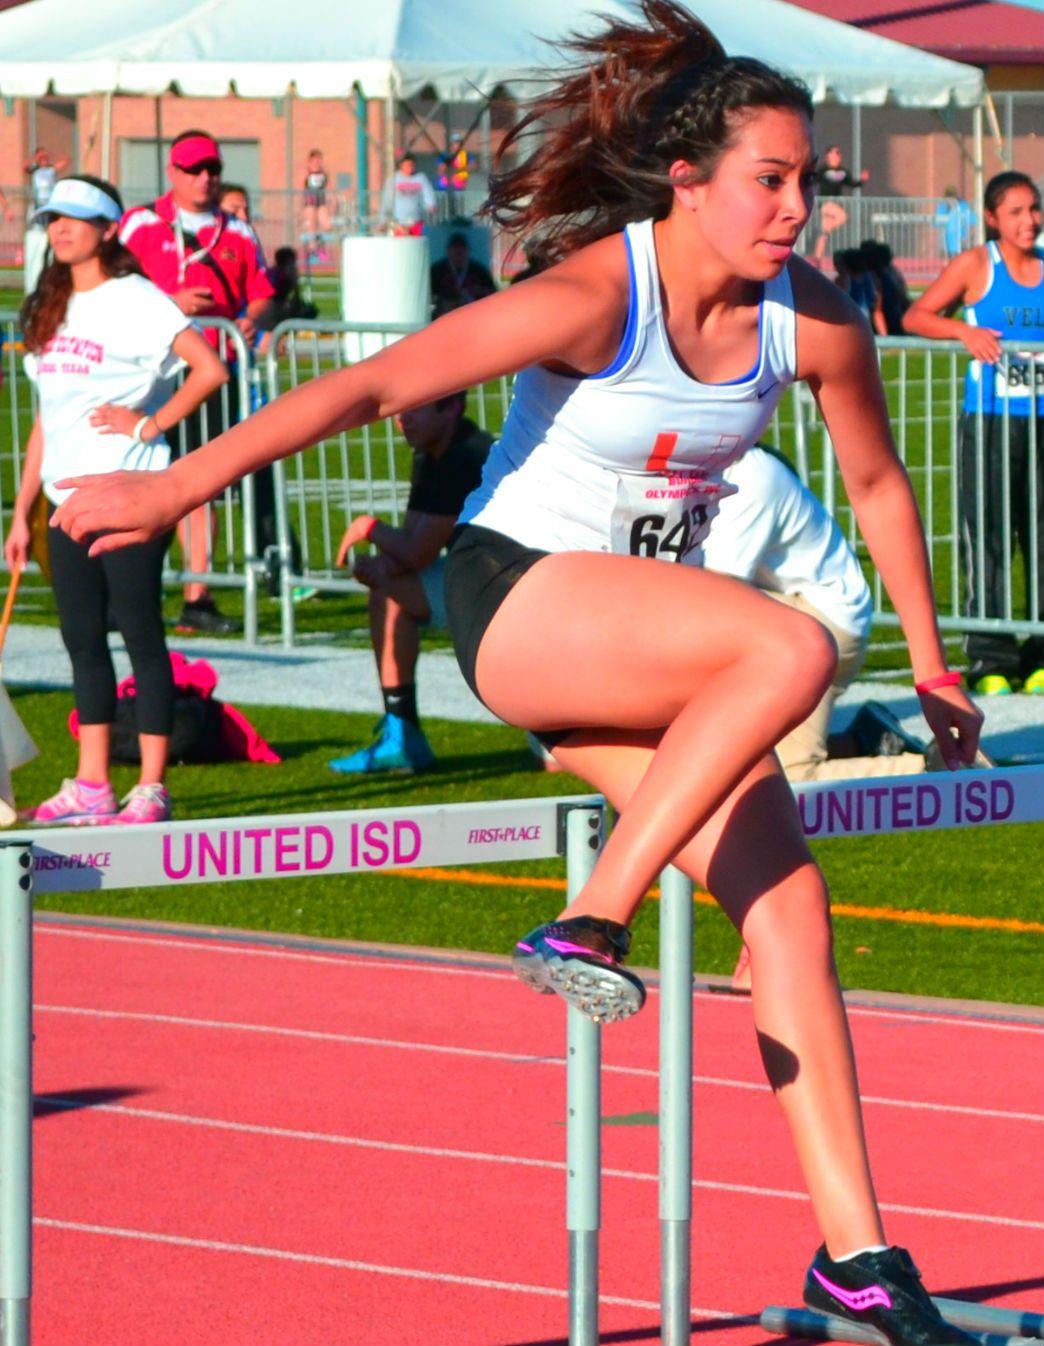 Laredo Sports Wire